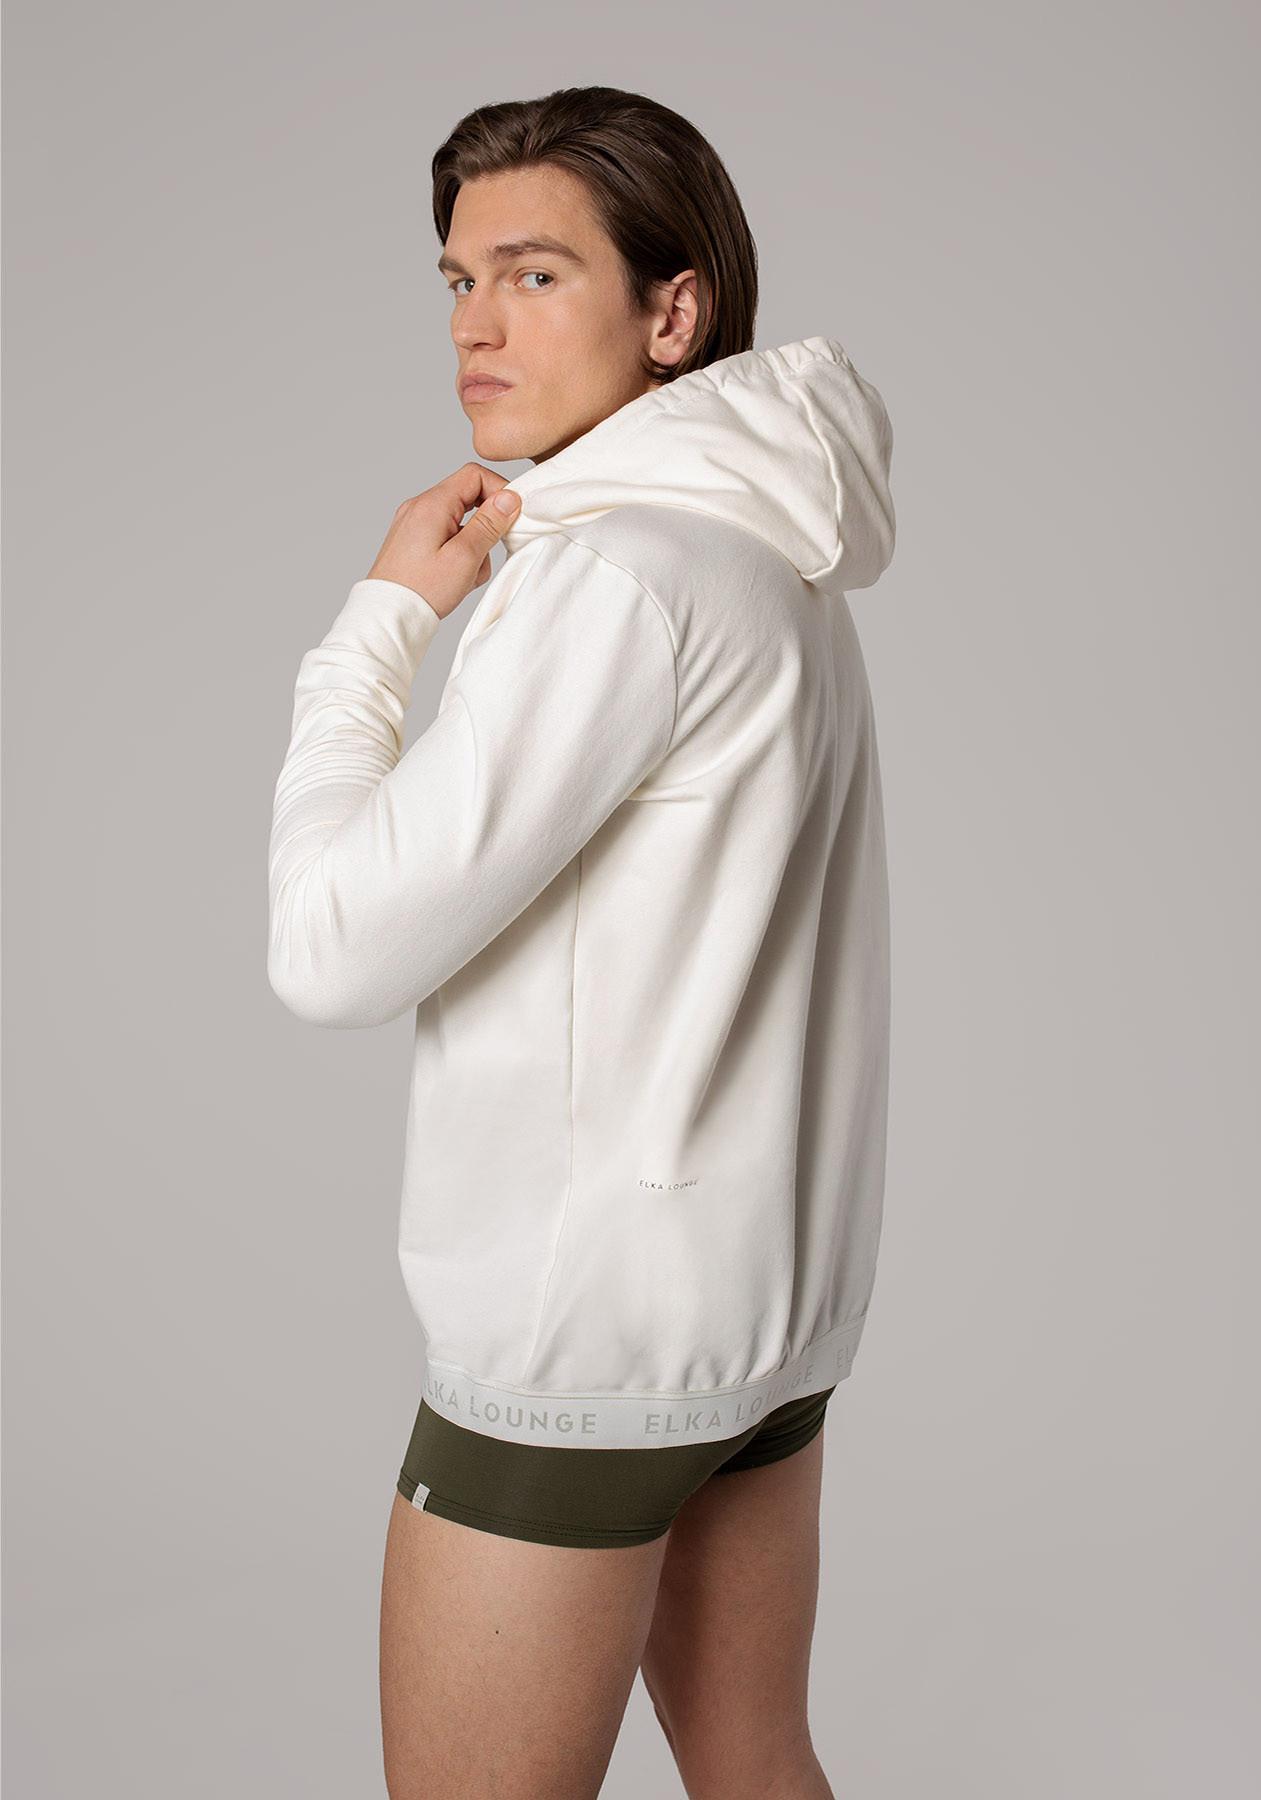 Men-Sweatshirt-ELKA-Lounge-M00573-1